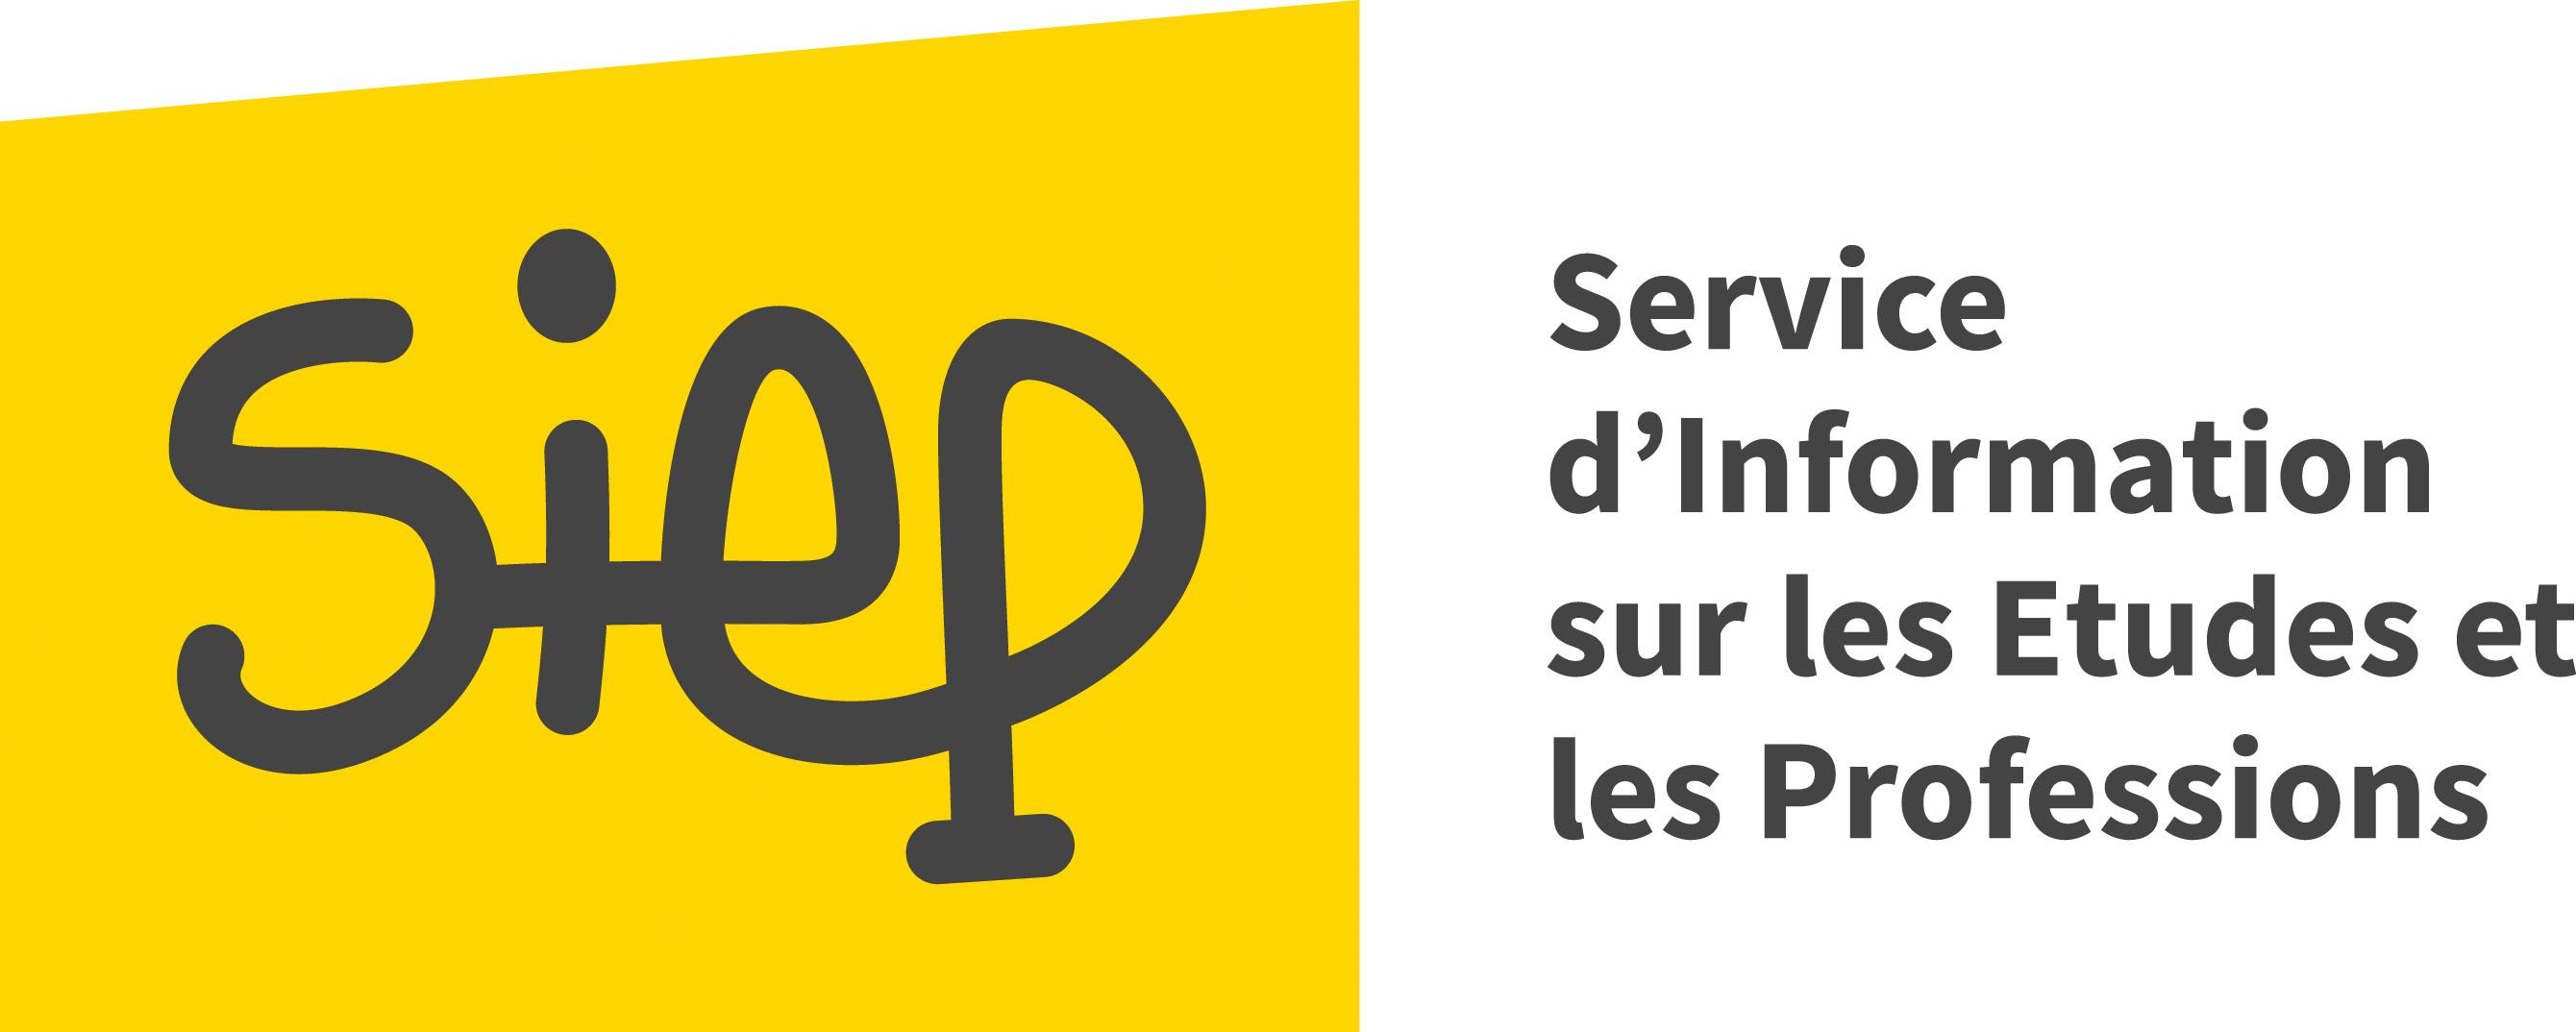 Siep : Service d